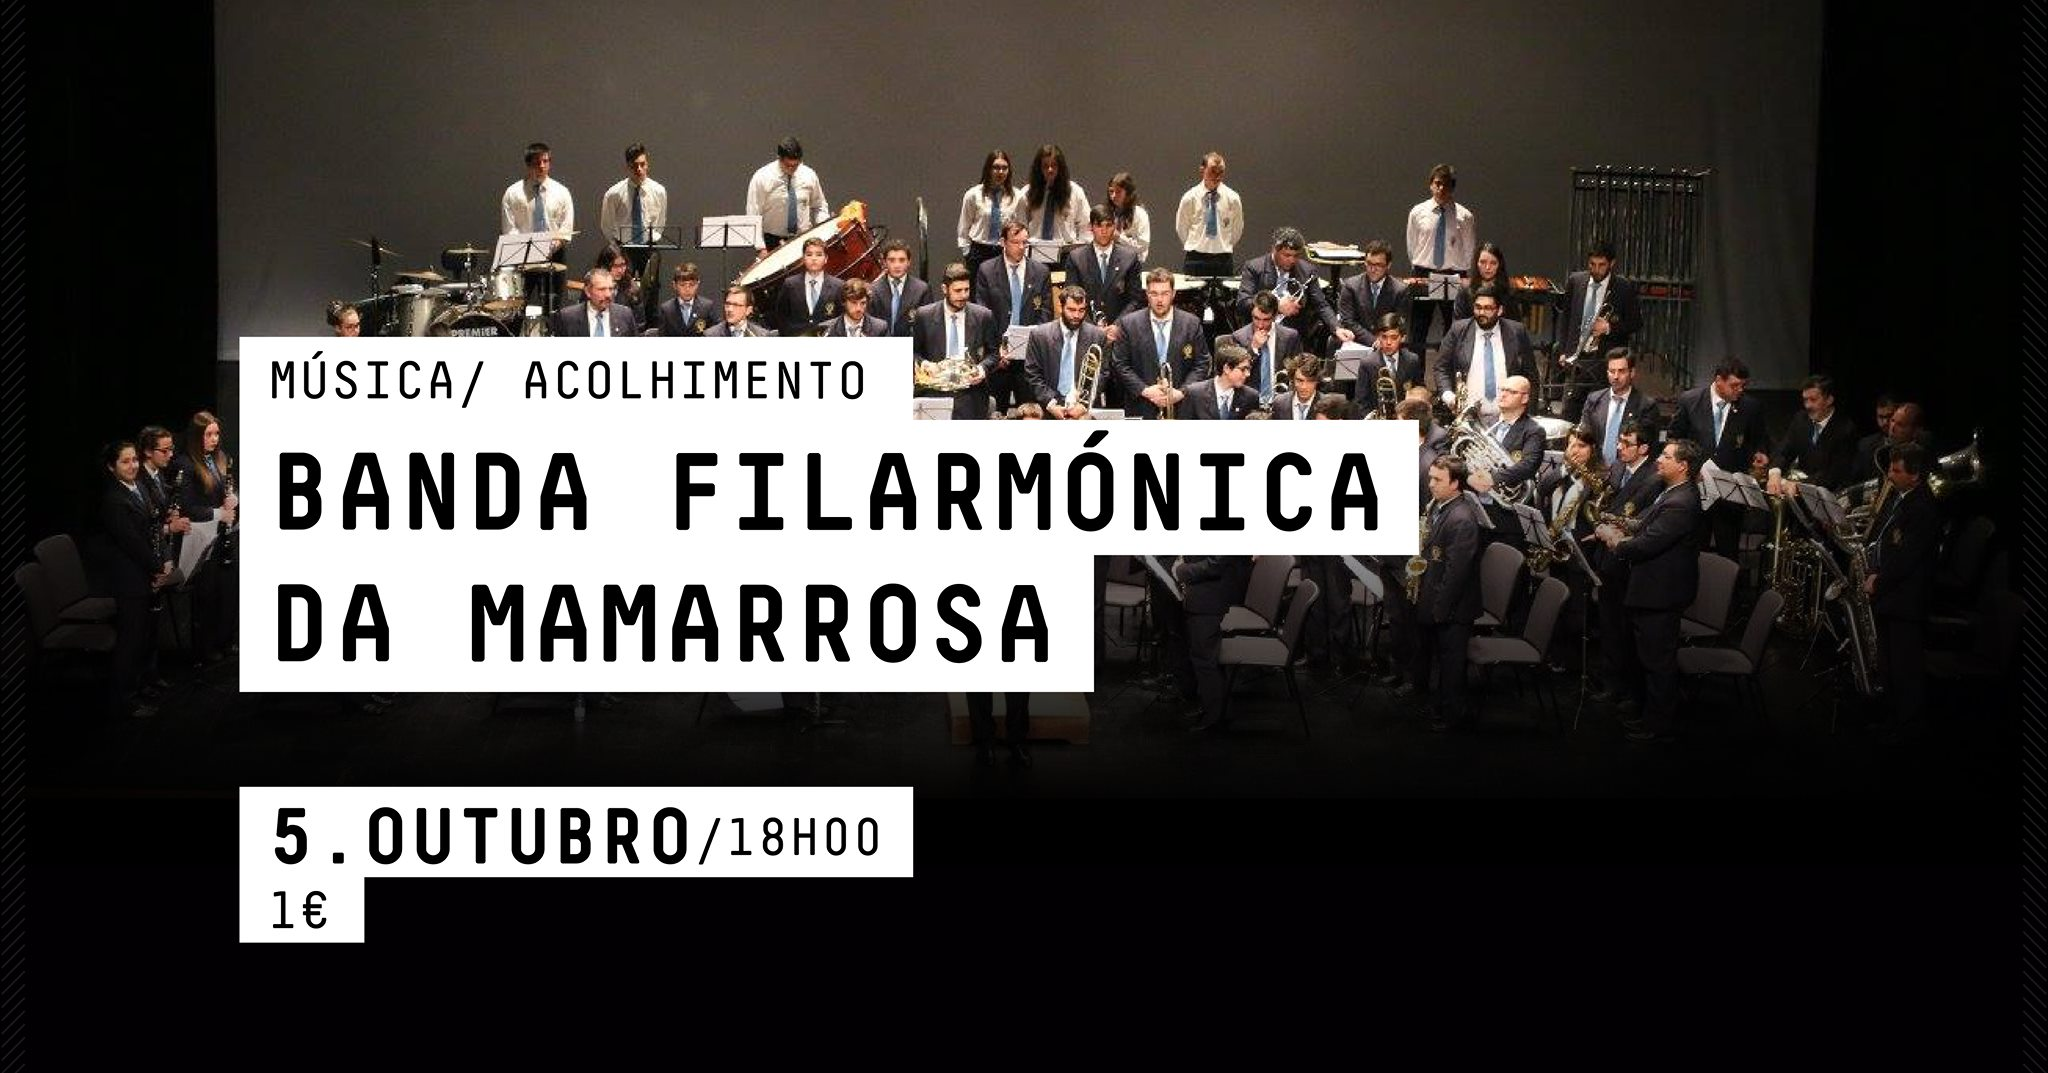 BANDA FILARMÓNICA DA MAMARROSA ACOLHIMENTO / MÚSICA